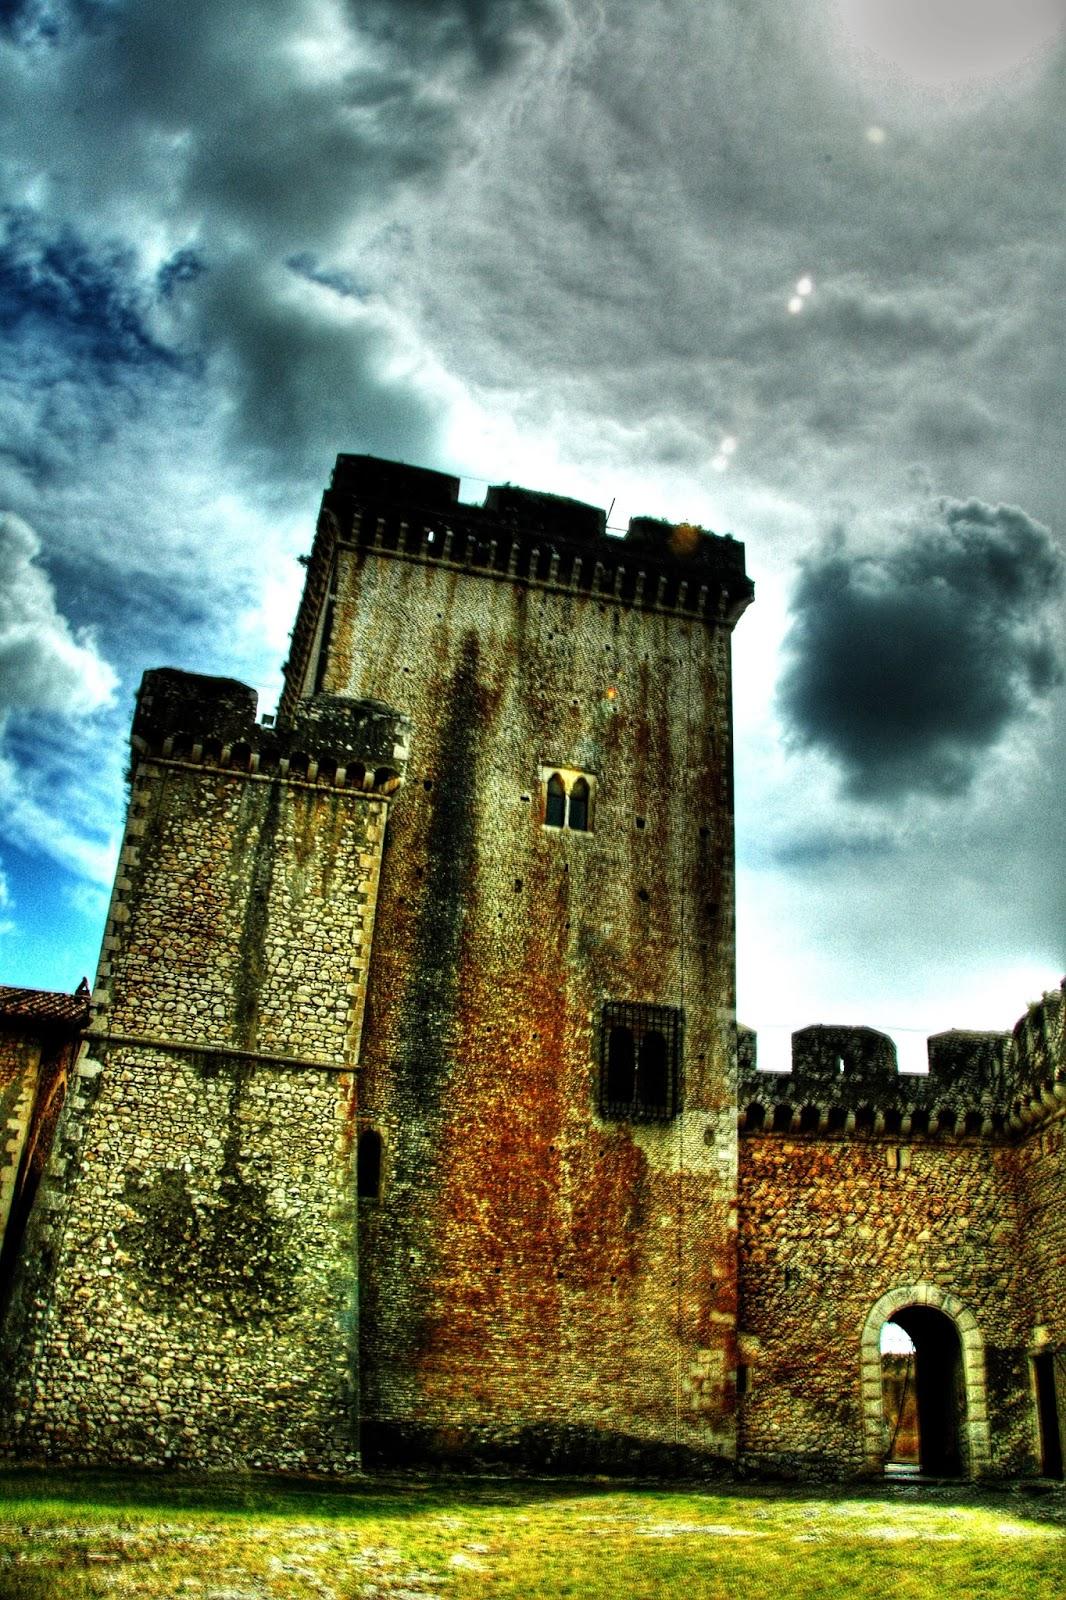 Paolo+Macorig - Burgo Medieval e Castelo de Sermoneta